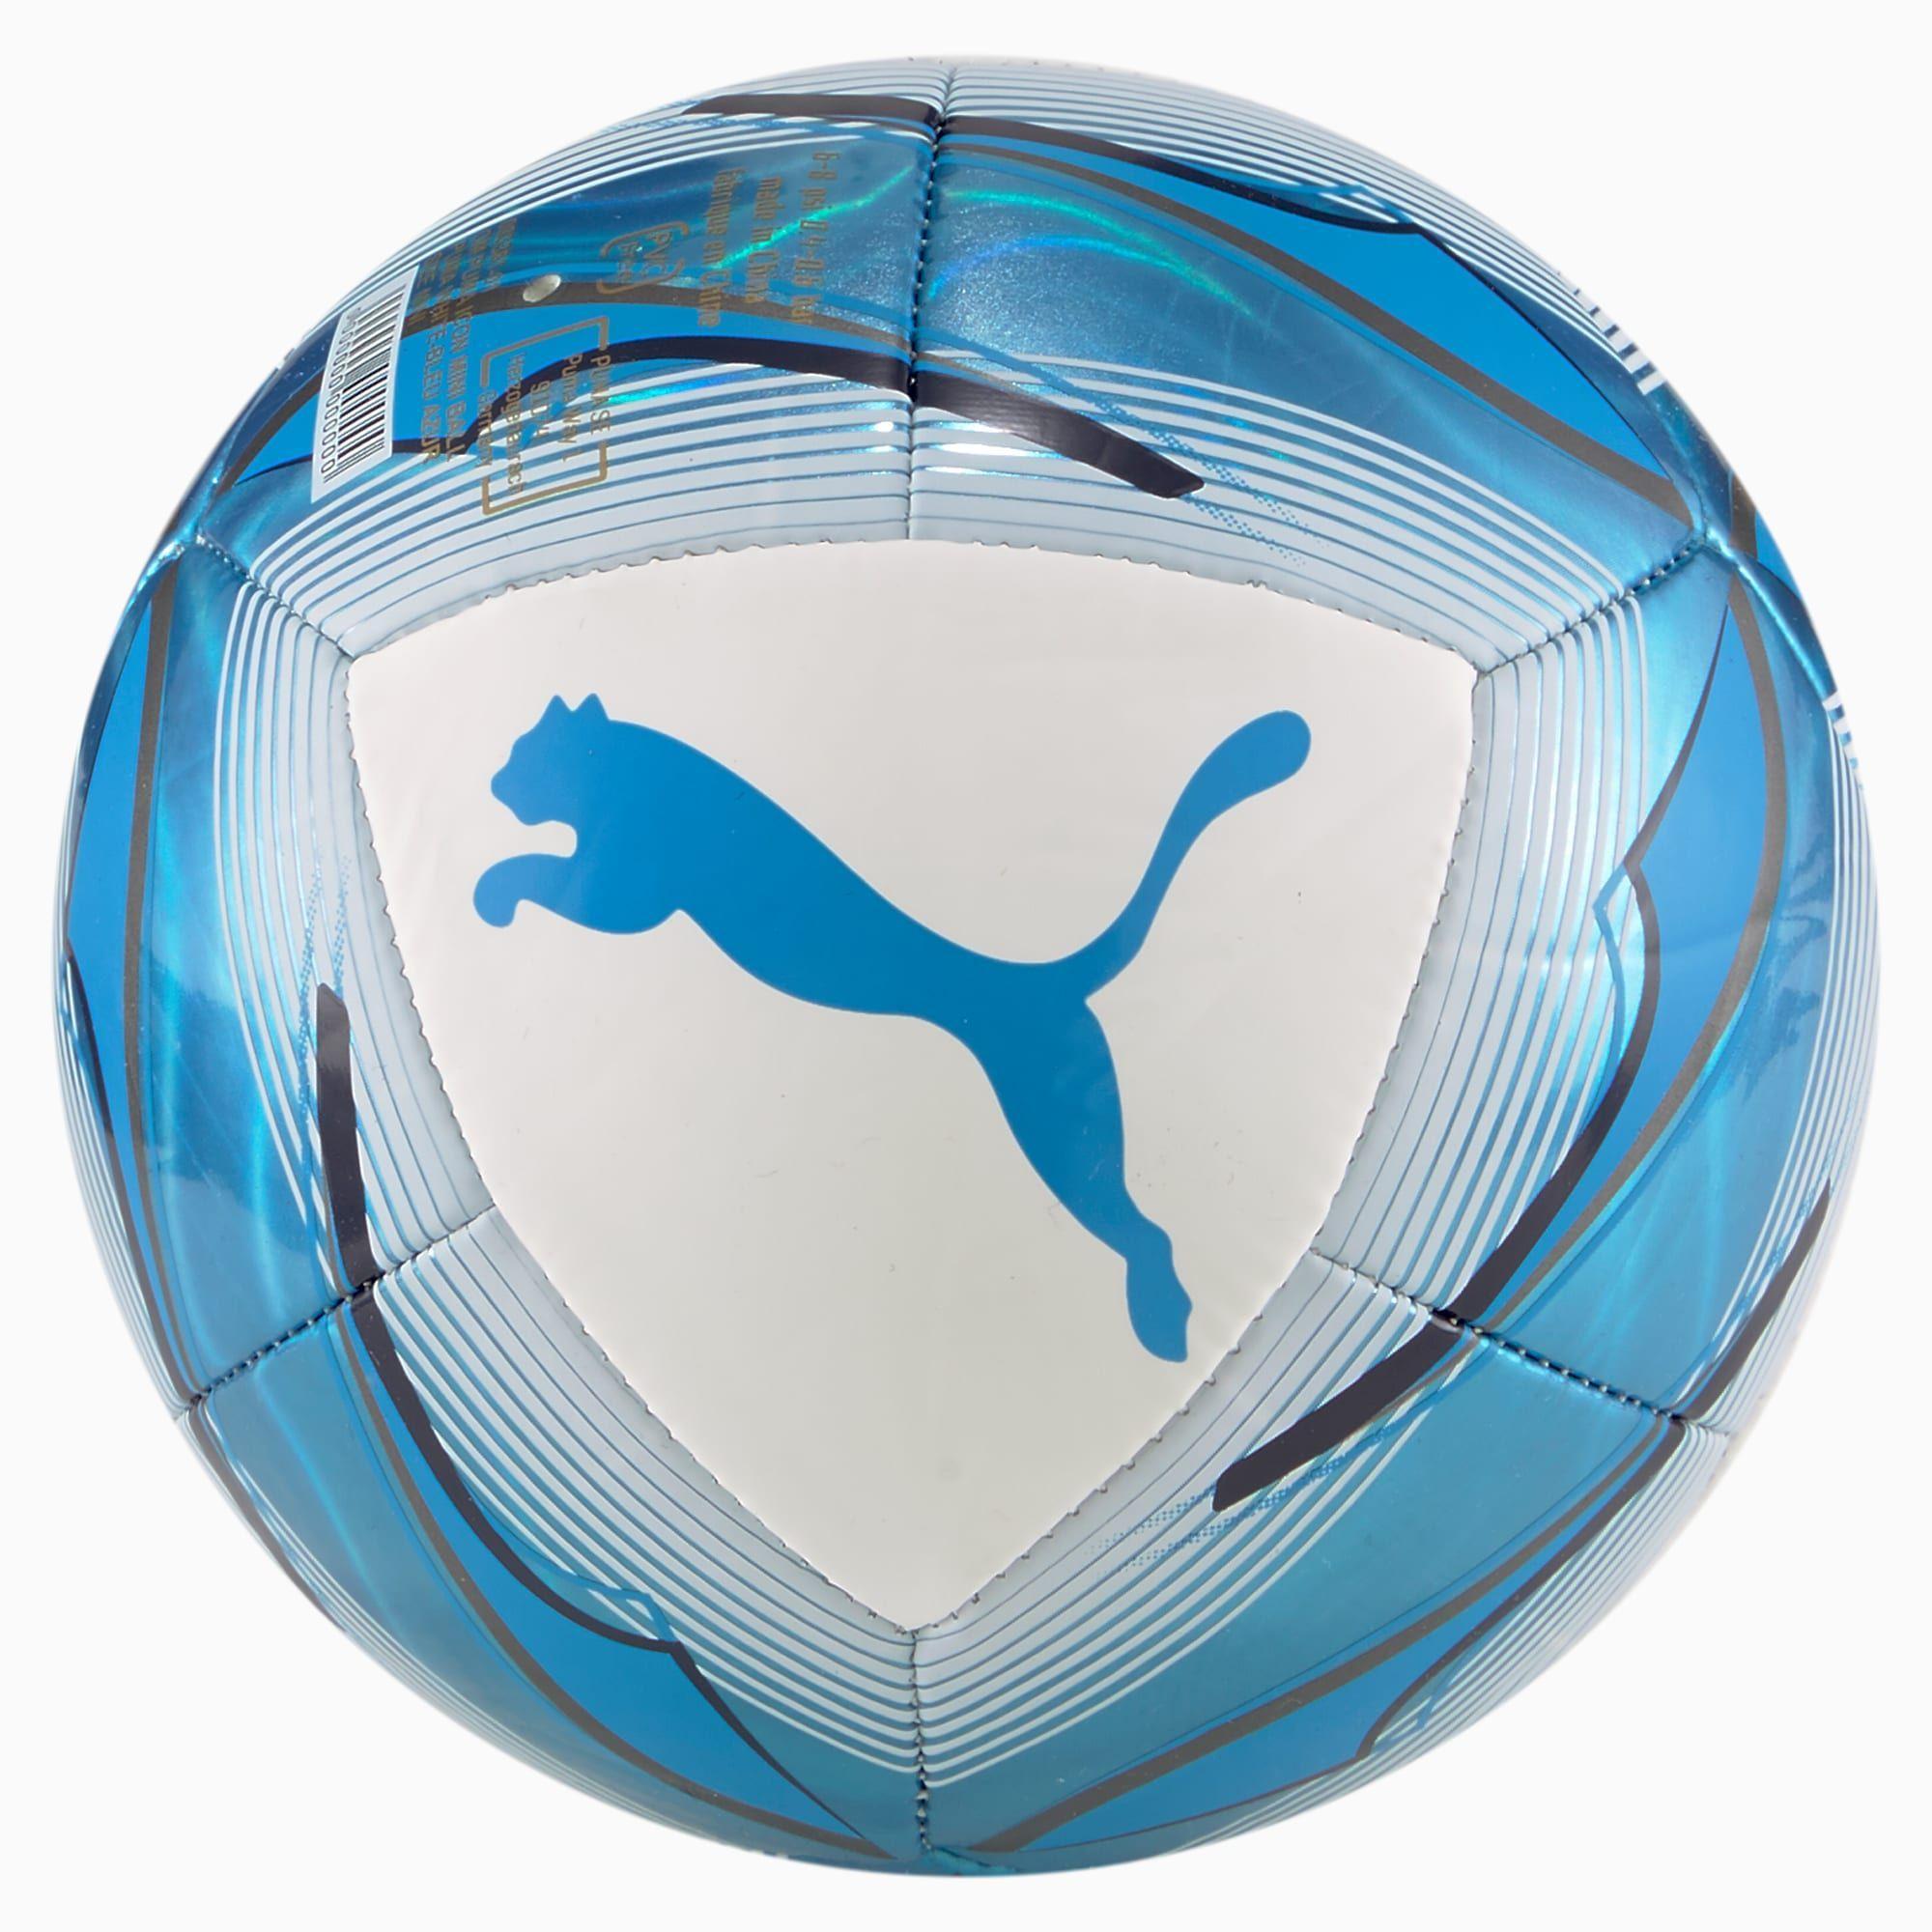 Women's PUMA Olympique De Marseille Icon Mini Football, White/Azure,  Accessories | Olympique de marseille, Olympique marseille, Blau